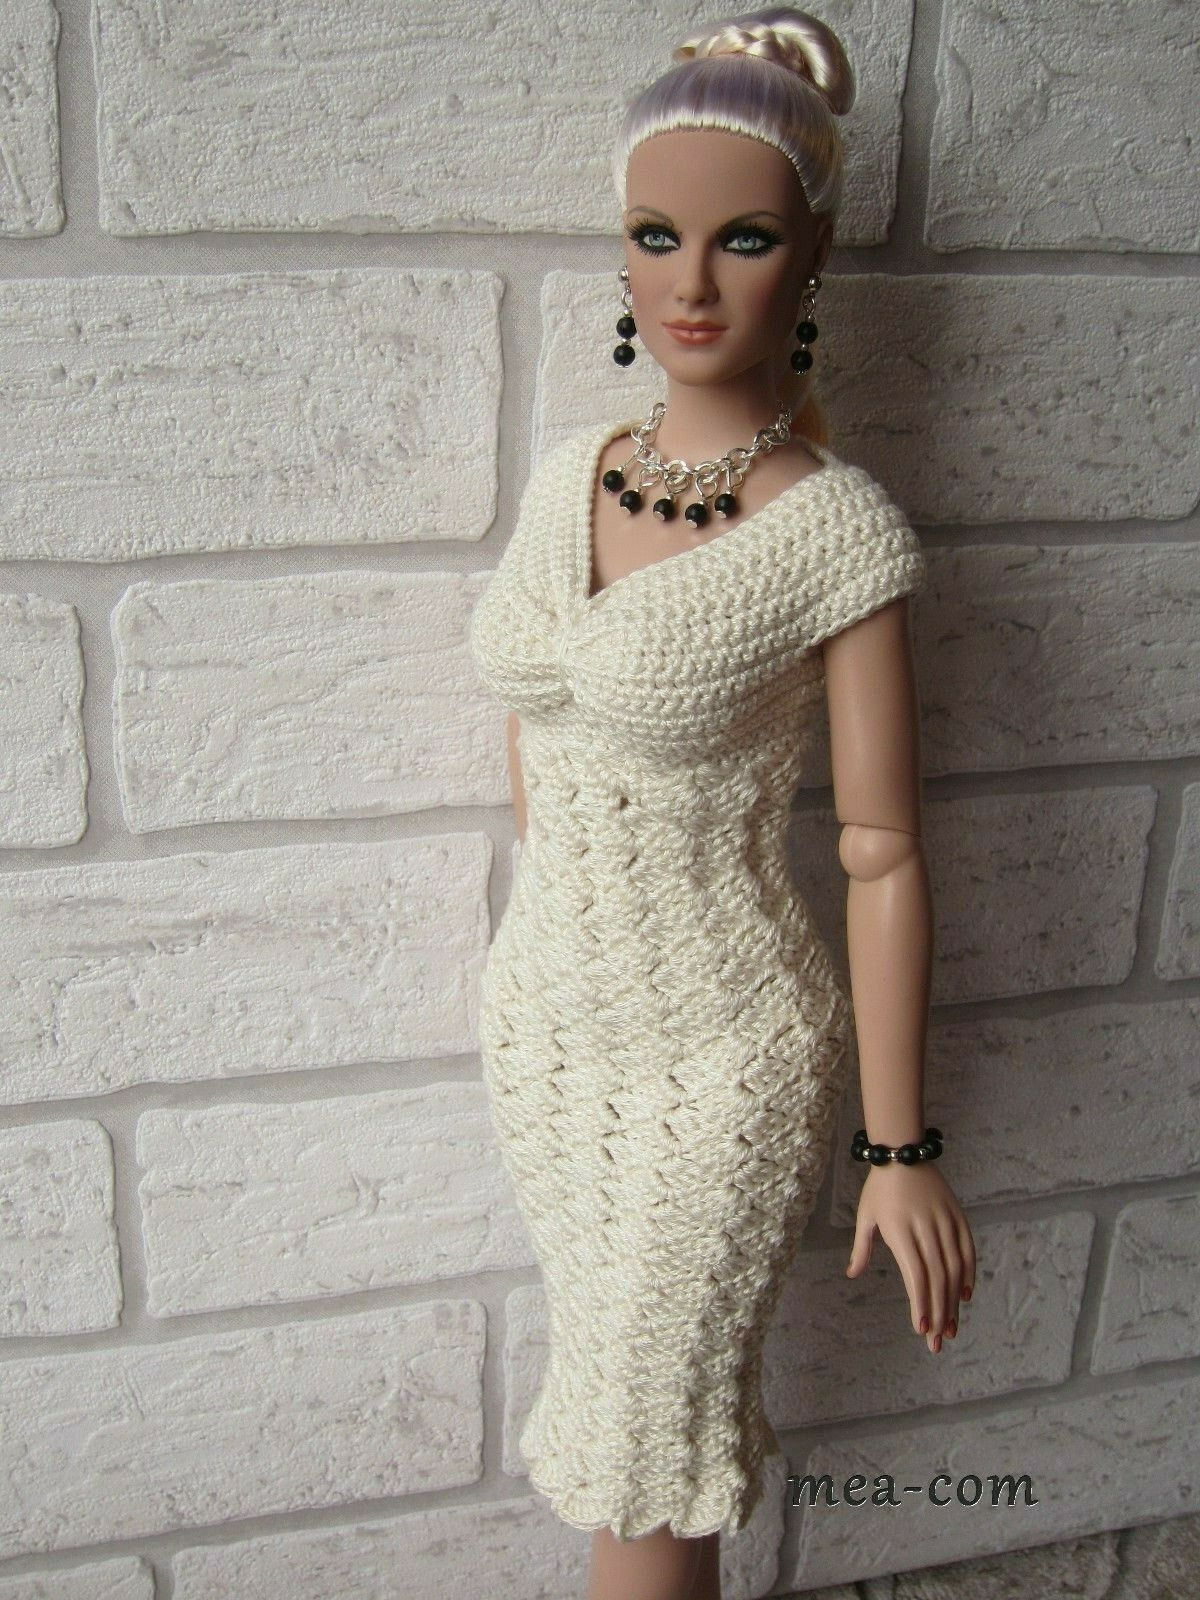 Vêtement Outfit Kleidung 17  TONNER DeeDee    DeeAnna Denton Poupée uomonequin 4  in vendita scontato del 70%